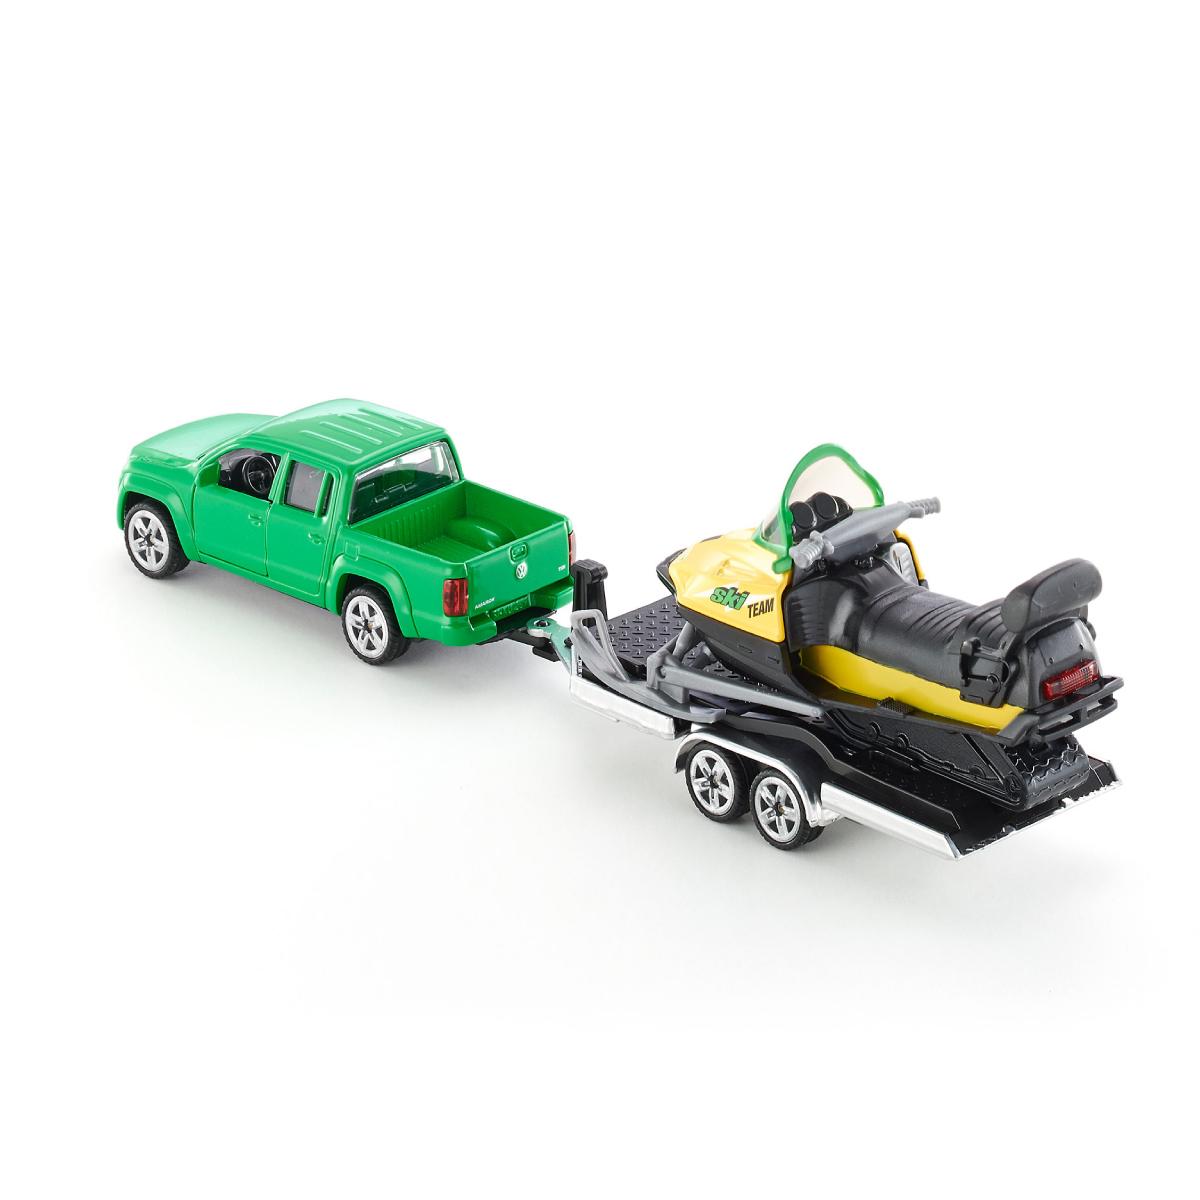 VW アマロック スノーモービルトレーラー付き 1:55(ジク・SIKU)